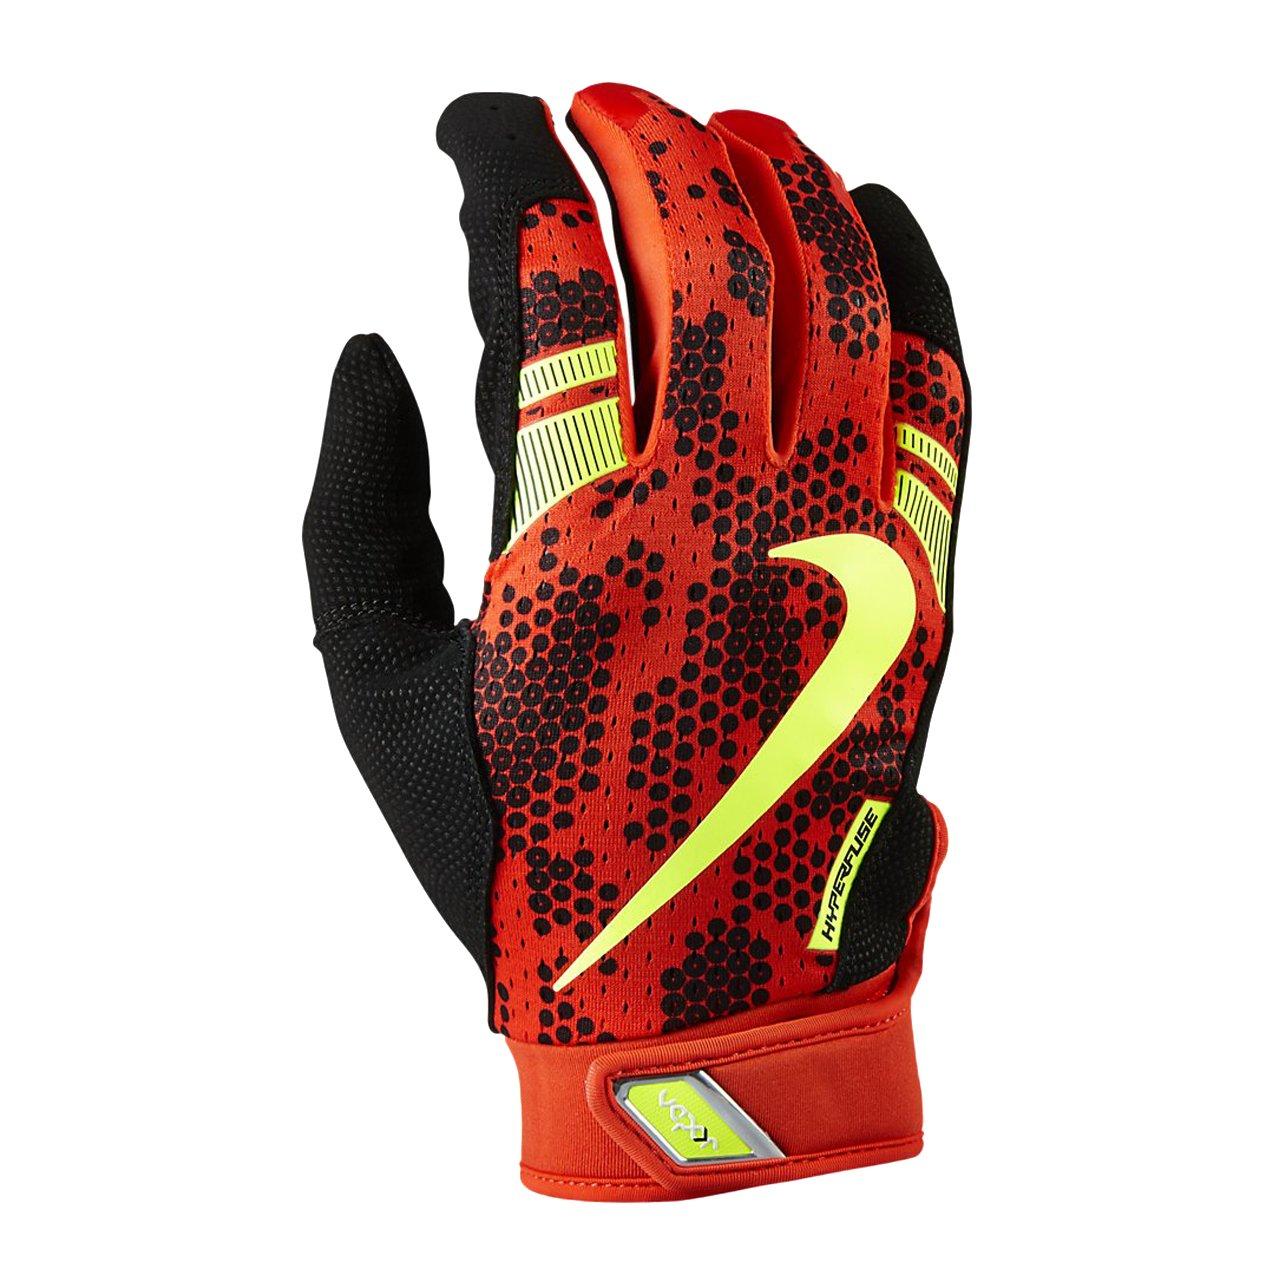 Amazon.com   Nike Vapor Elite Pro 3.0 Batting Glove (Medium)   Sports    Outdoors 43e047fed2